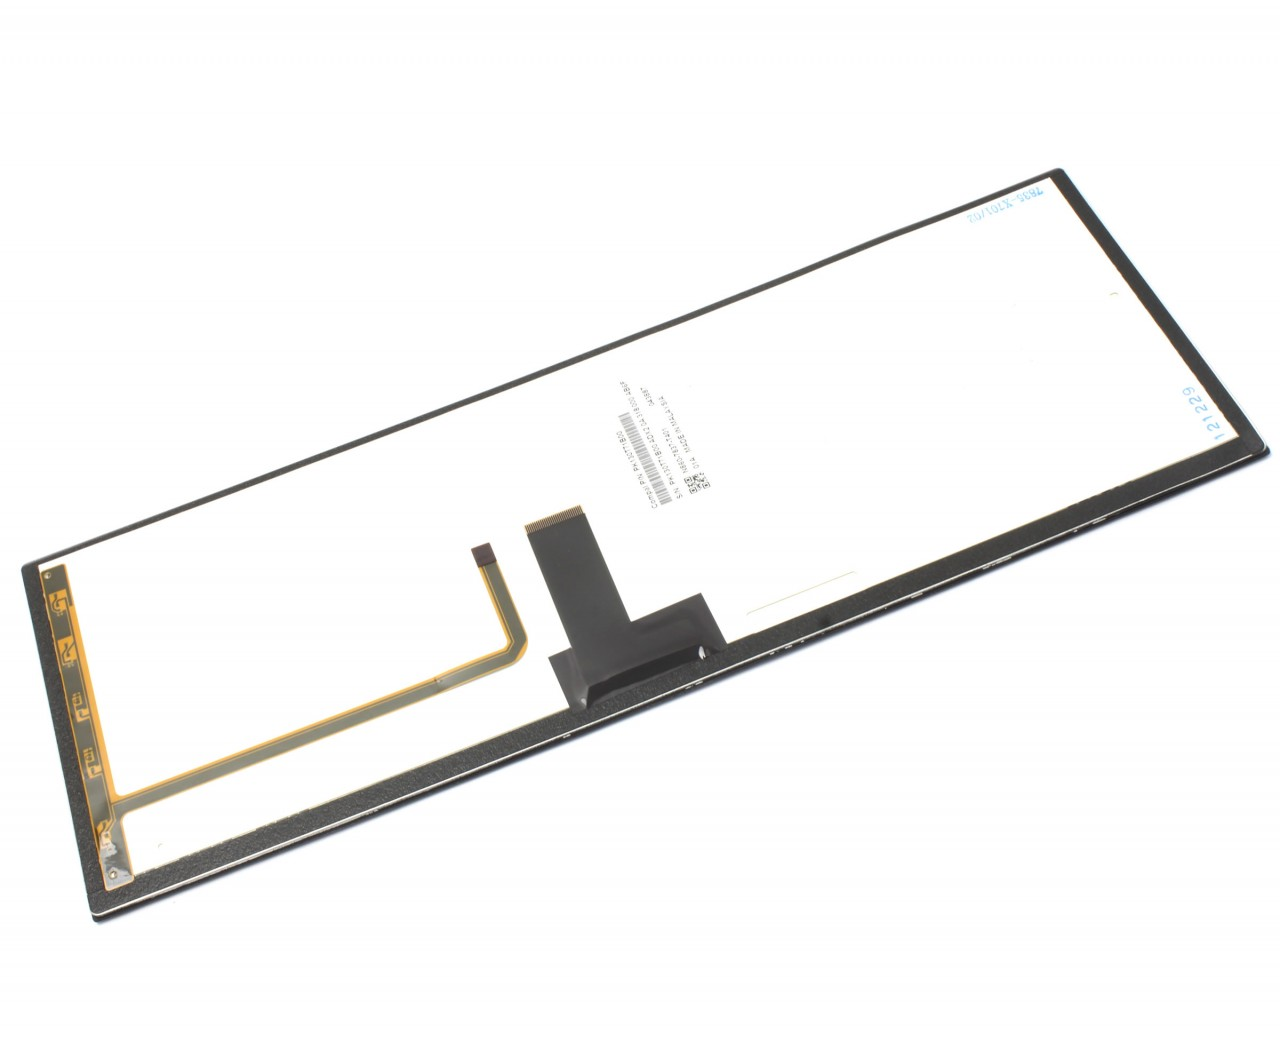 Tastatura Toshiba AEBU6E00020 EN Rama albastra iluminata backlit imagine powerlaptop.ro 2021